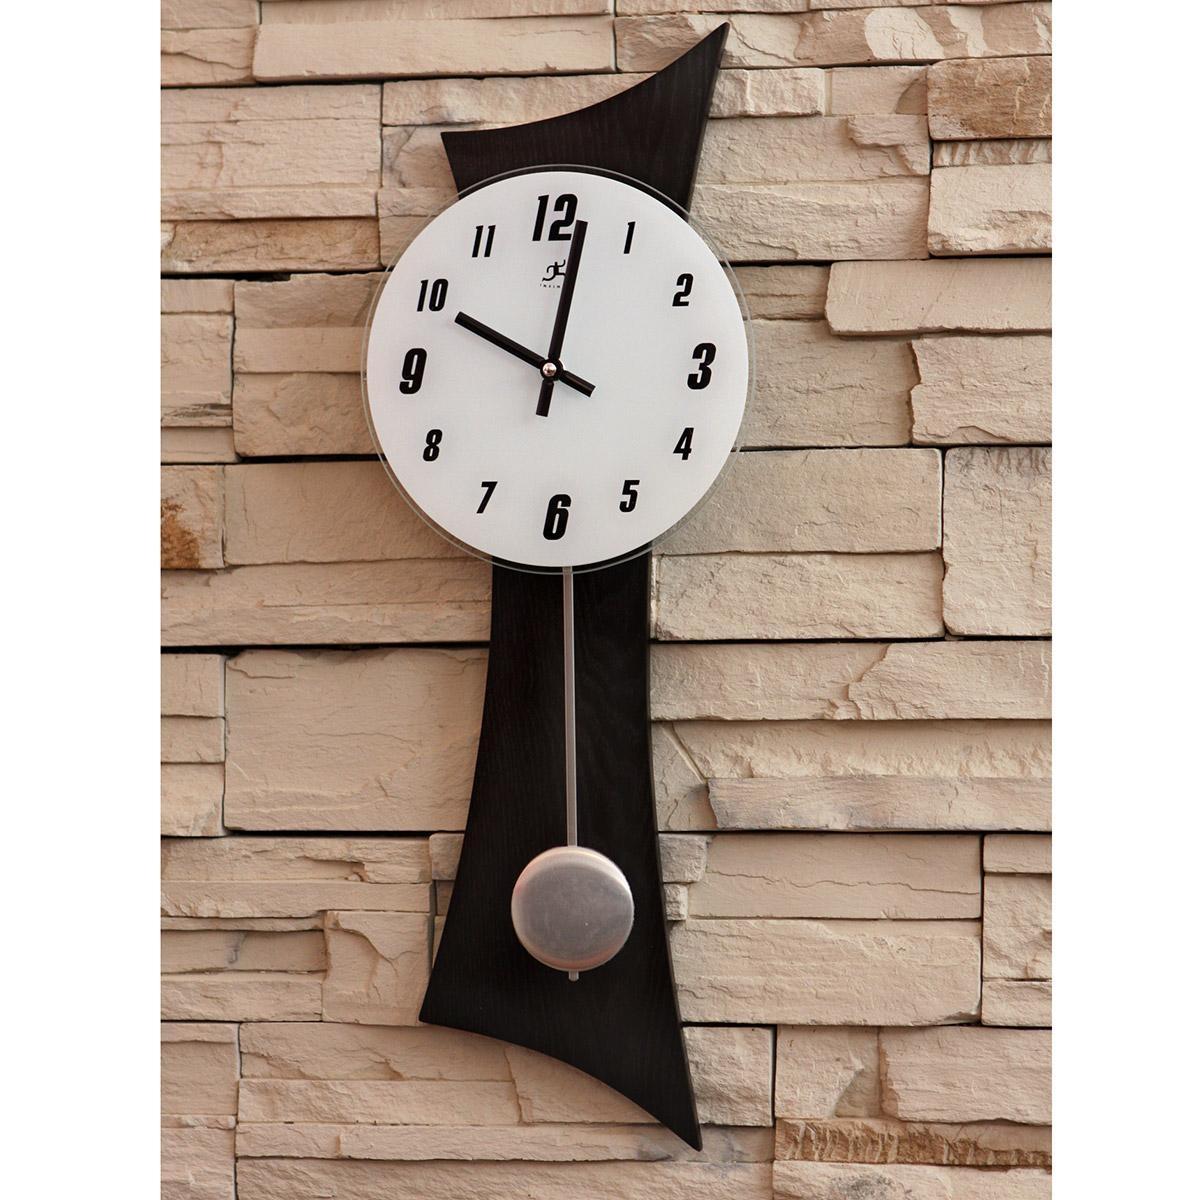 Splendid Deco Wall Clock 92 Deco Wall Clock Factory Large American With Regard To Art Deco Wall Clocks (View 19 of 20)